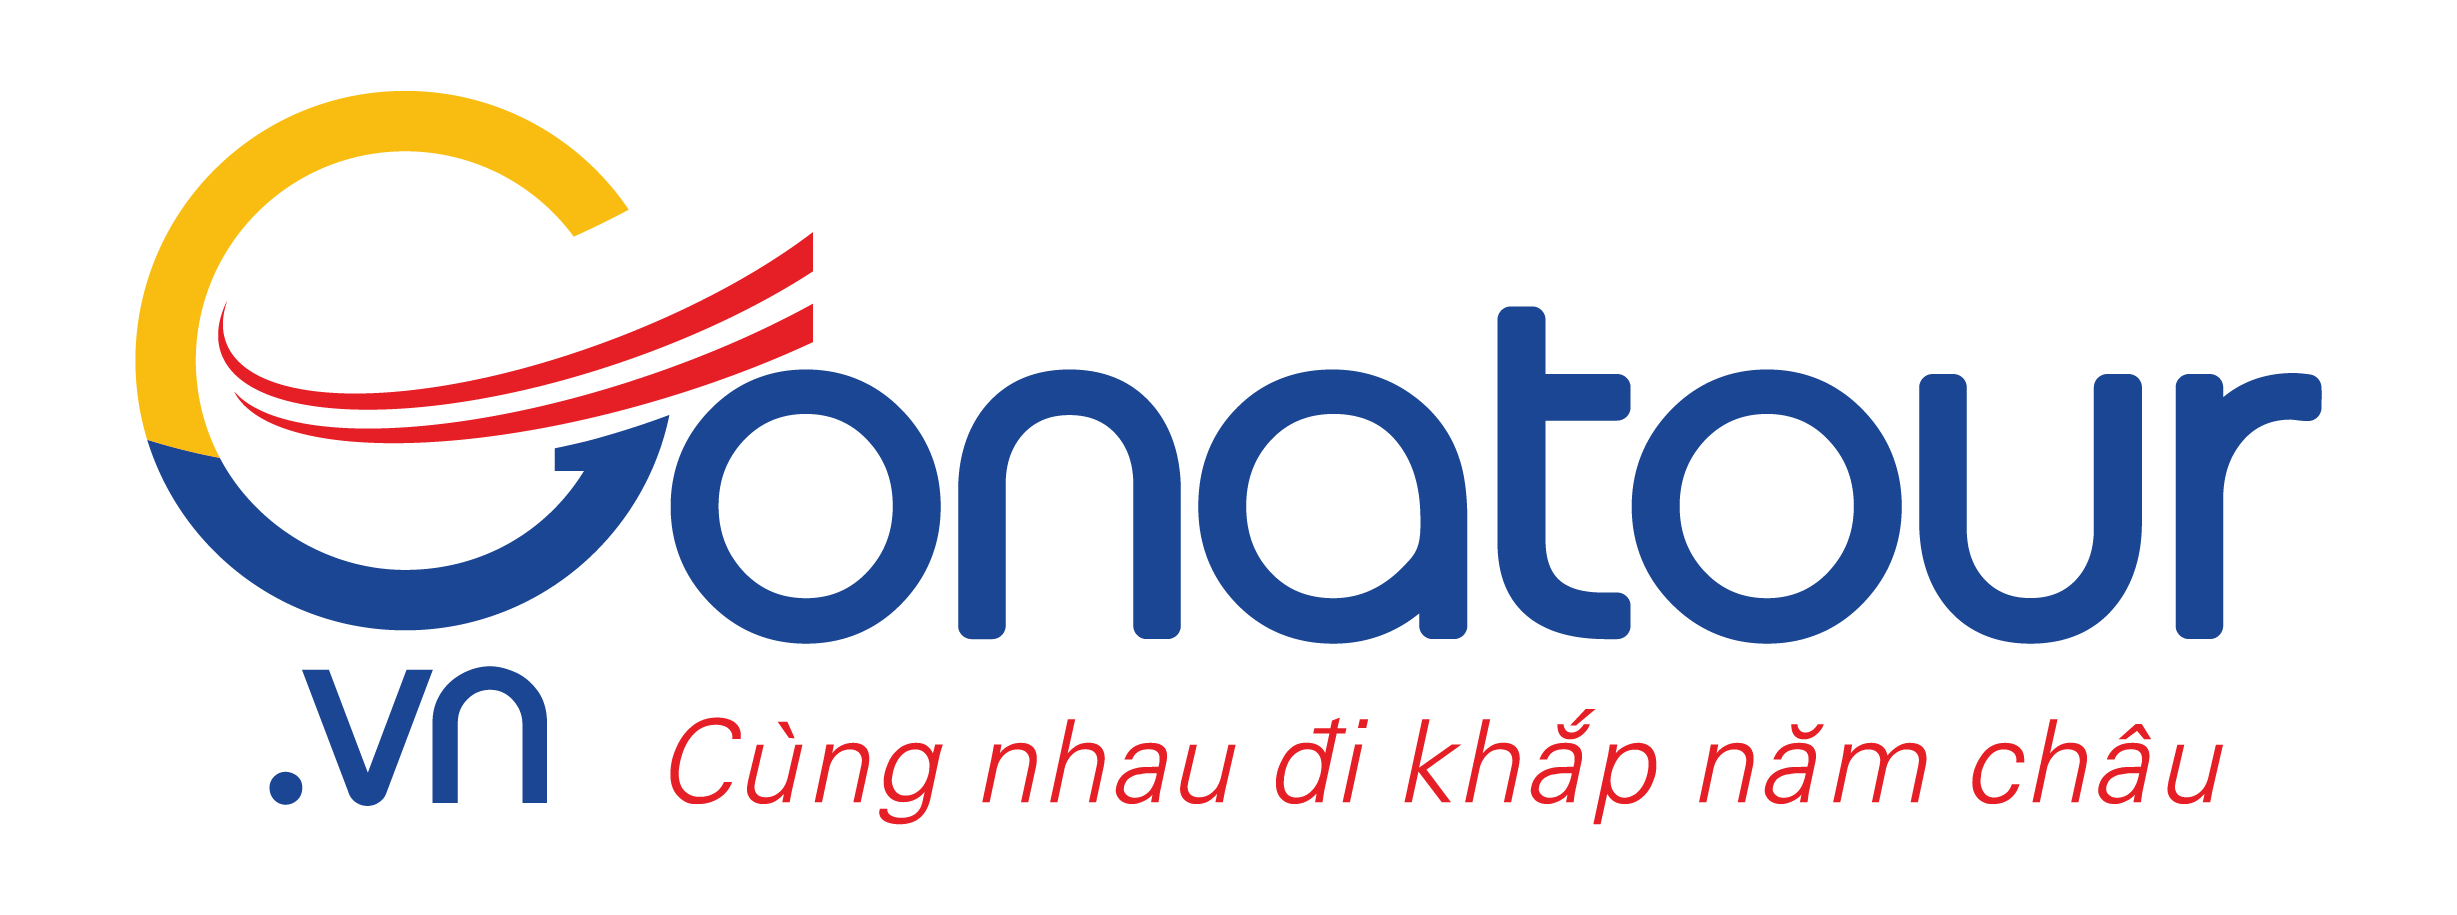 Gonatour